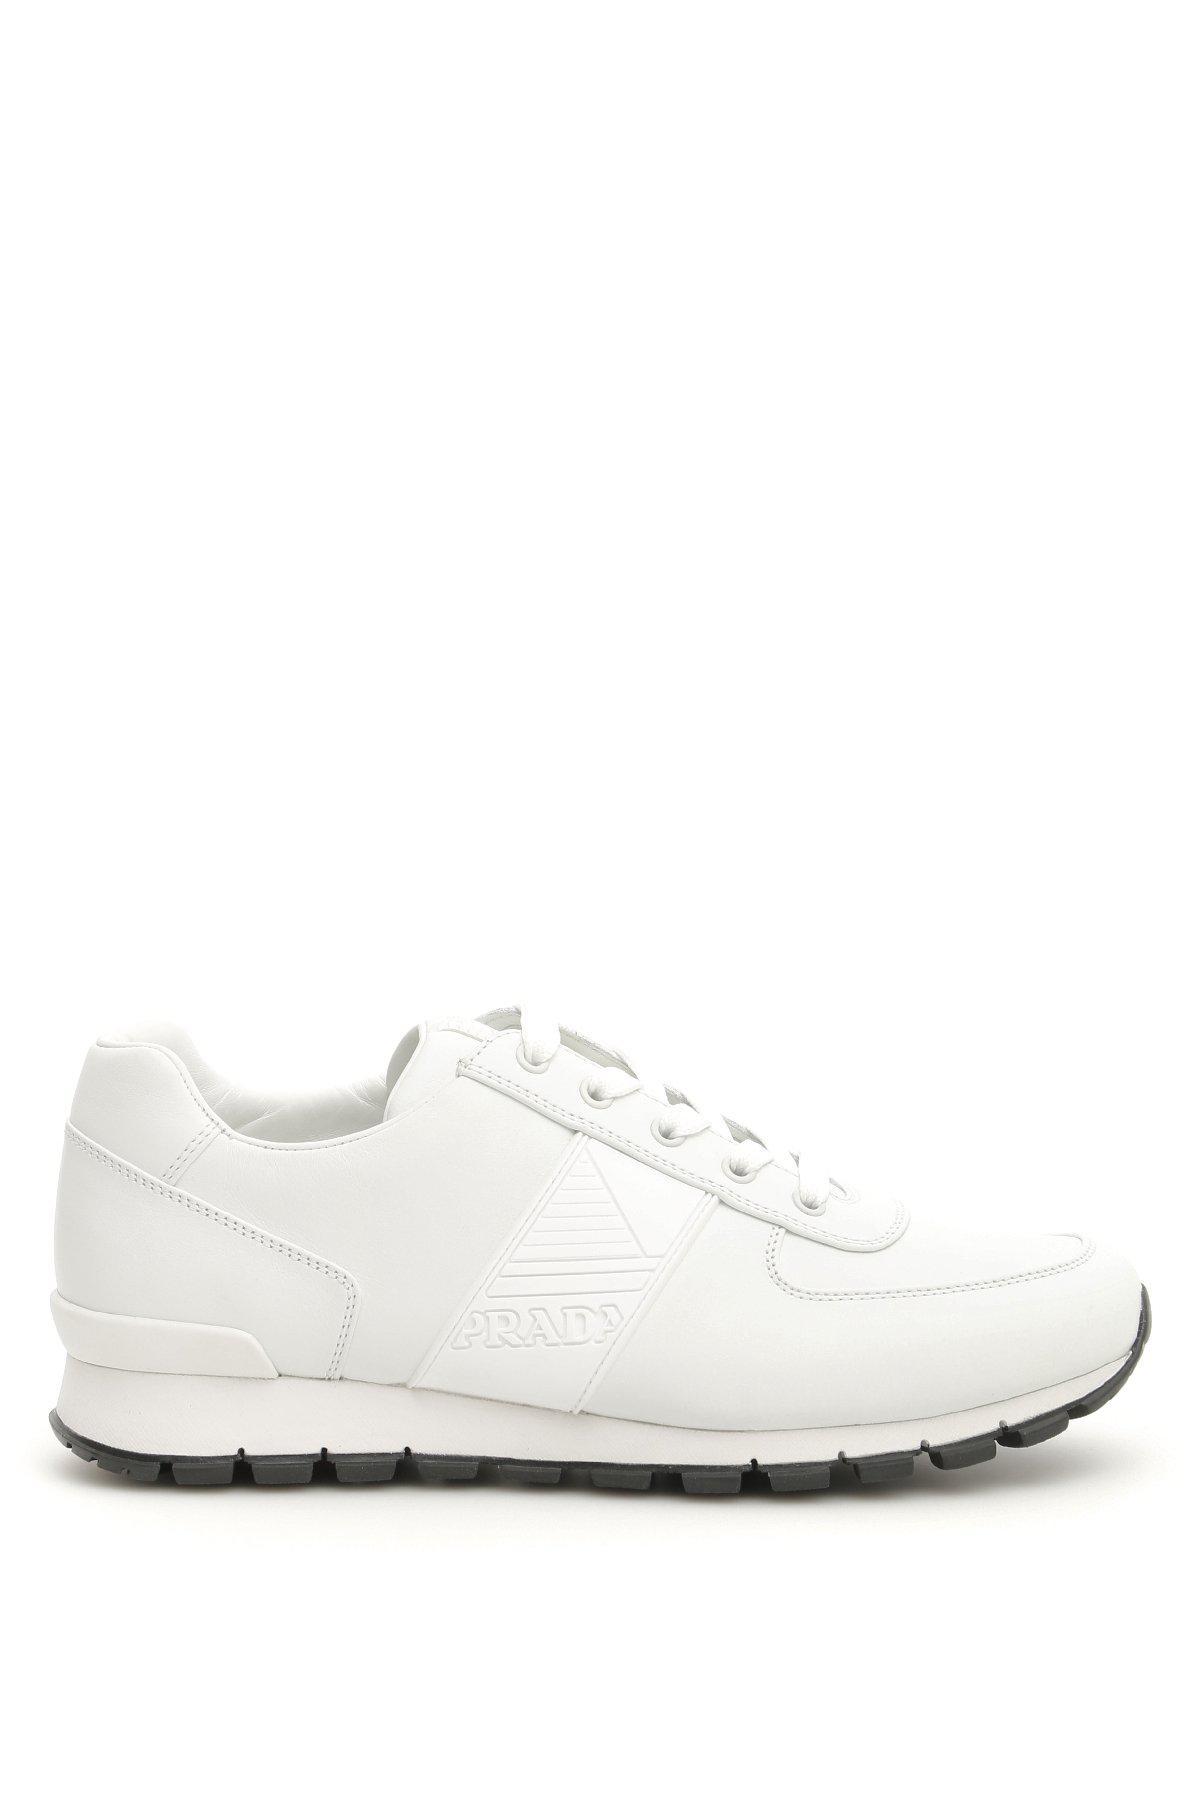 cf926d5cf31d Lyst - Prada Match Race Sneakers in White for Men